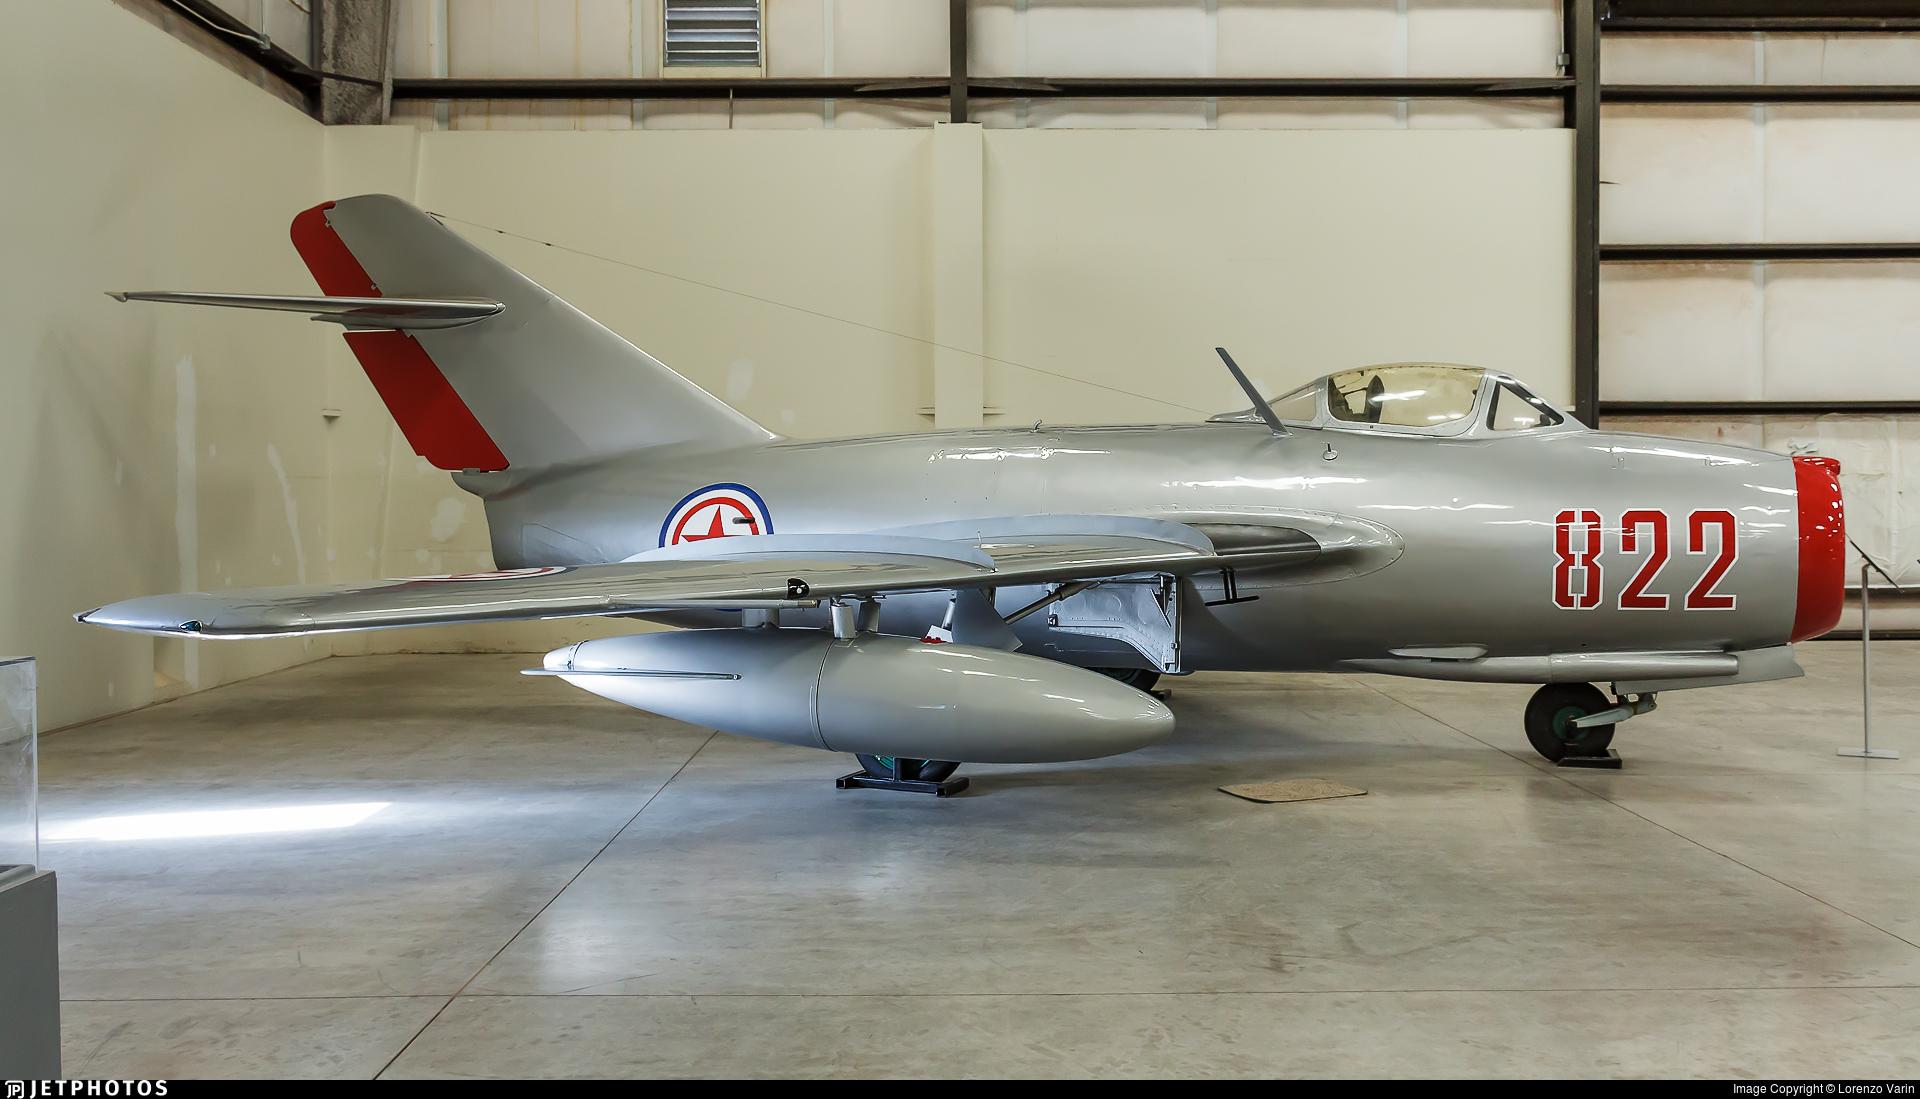 822 - Mikoyan-Gurevich MiG-15bis Fagot - North Korea - Air Force